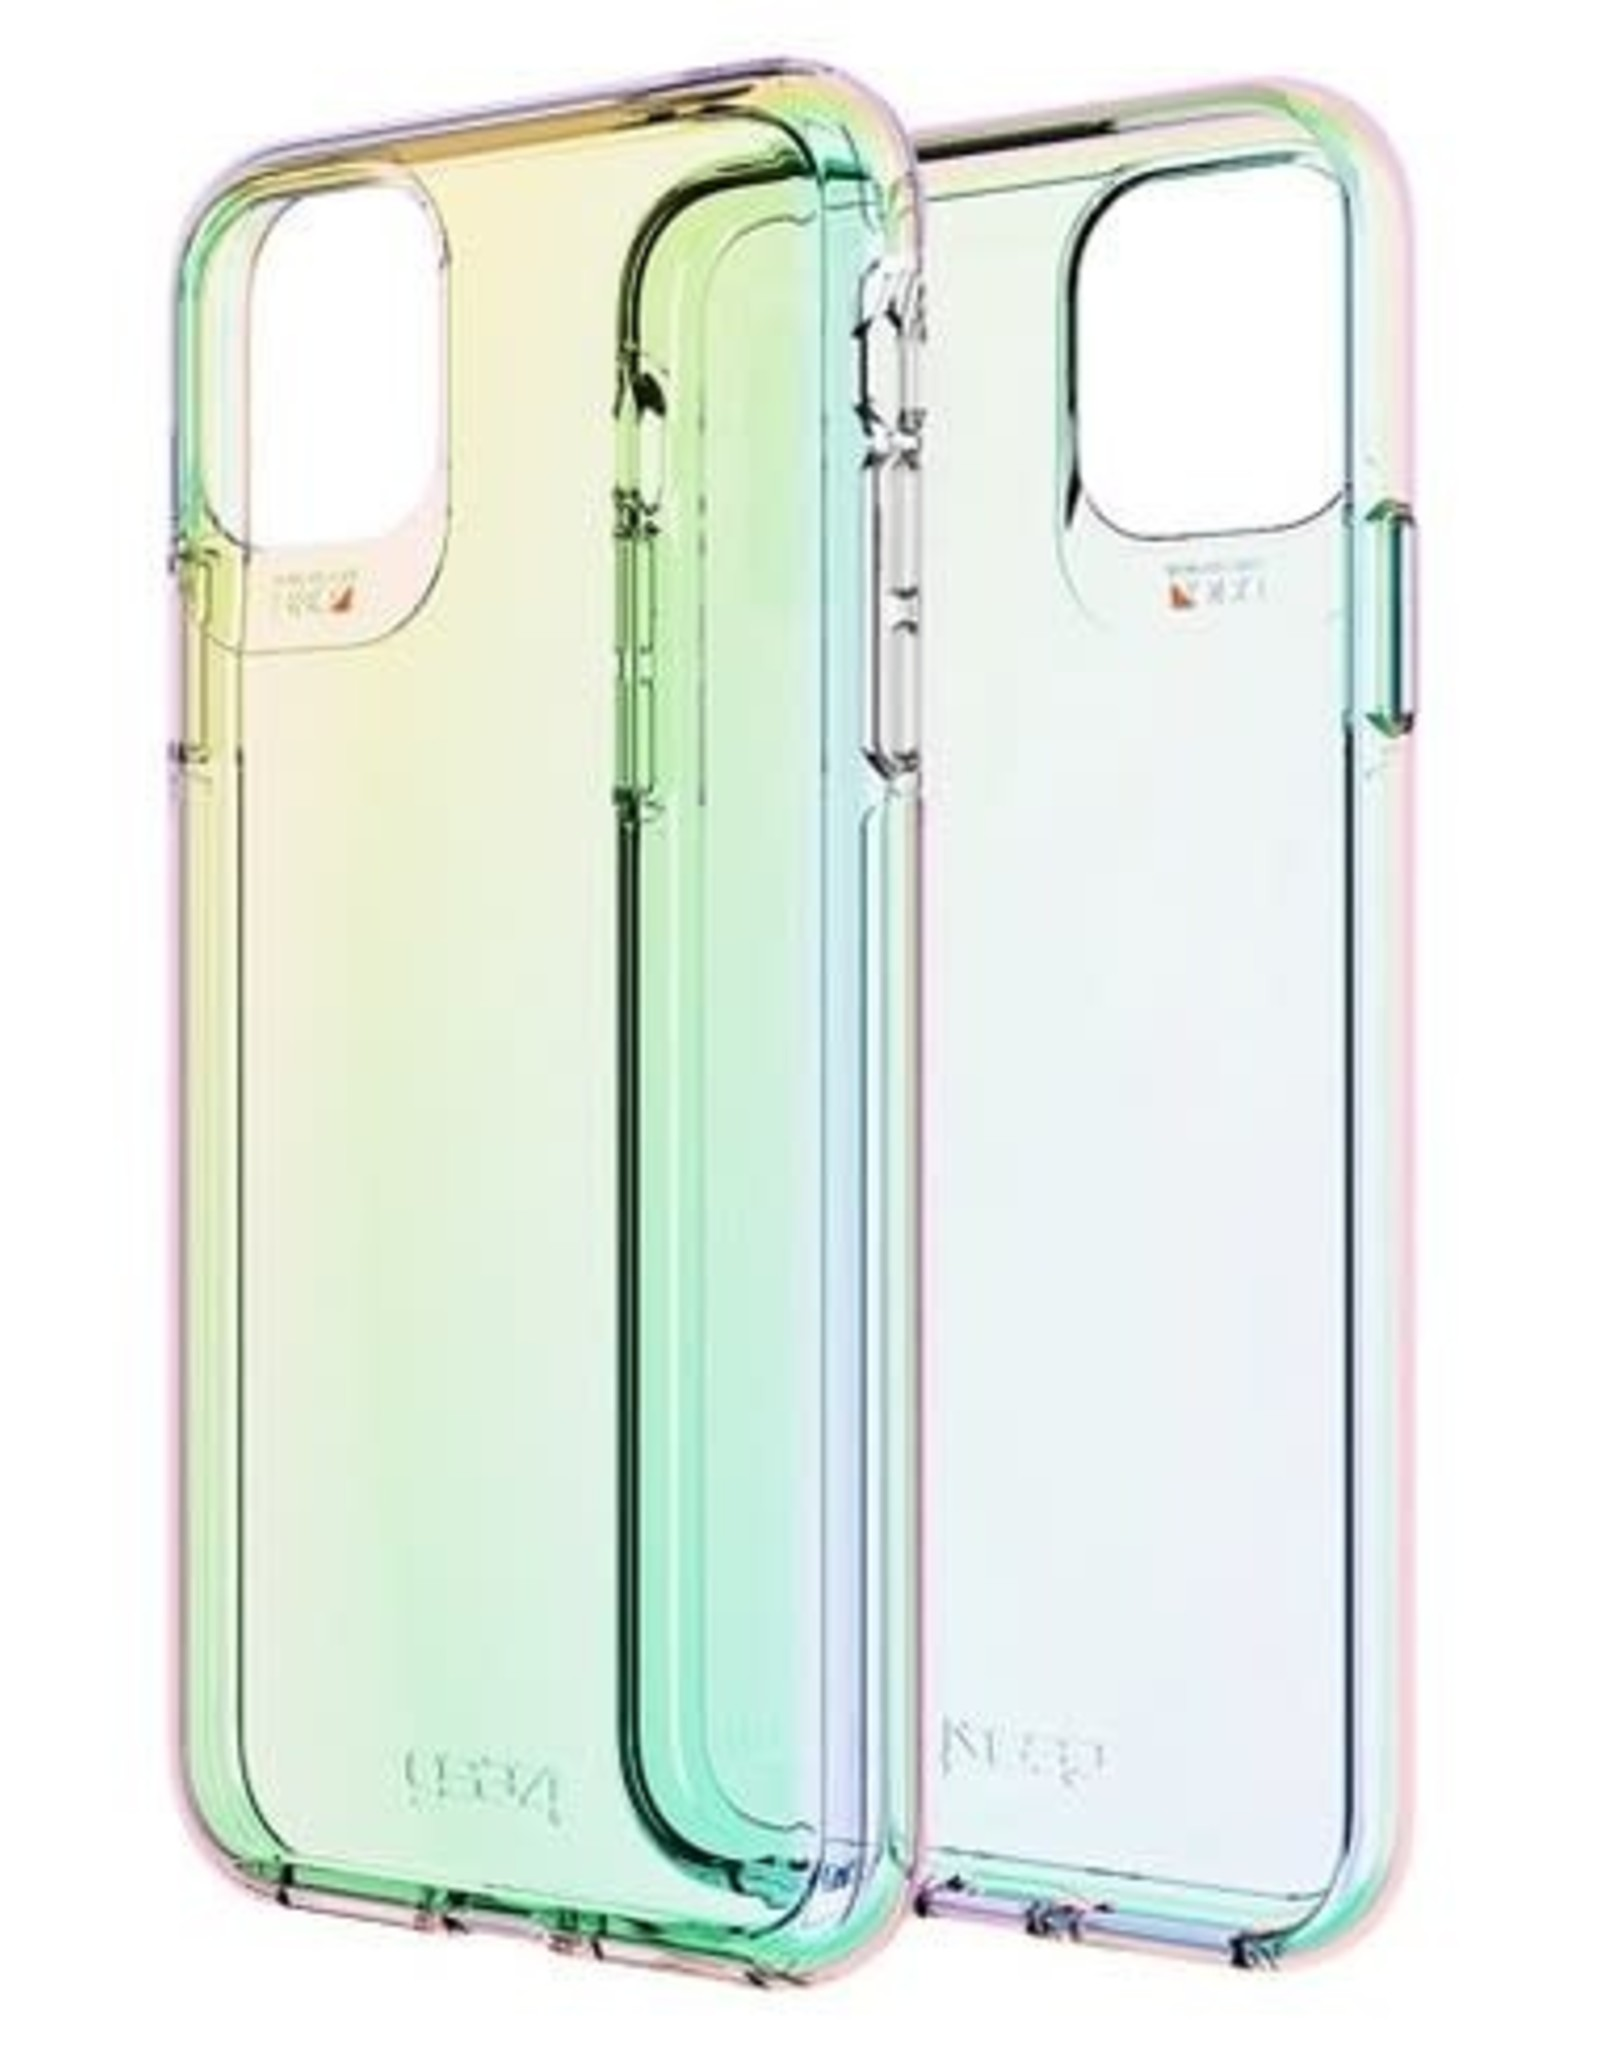 Gear4 Gear4 - iPhone 11 Pro - CRYSTAL PALACE CASE